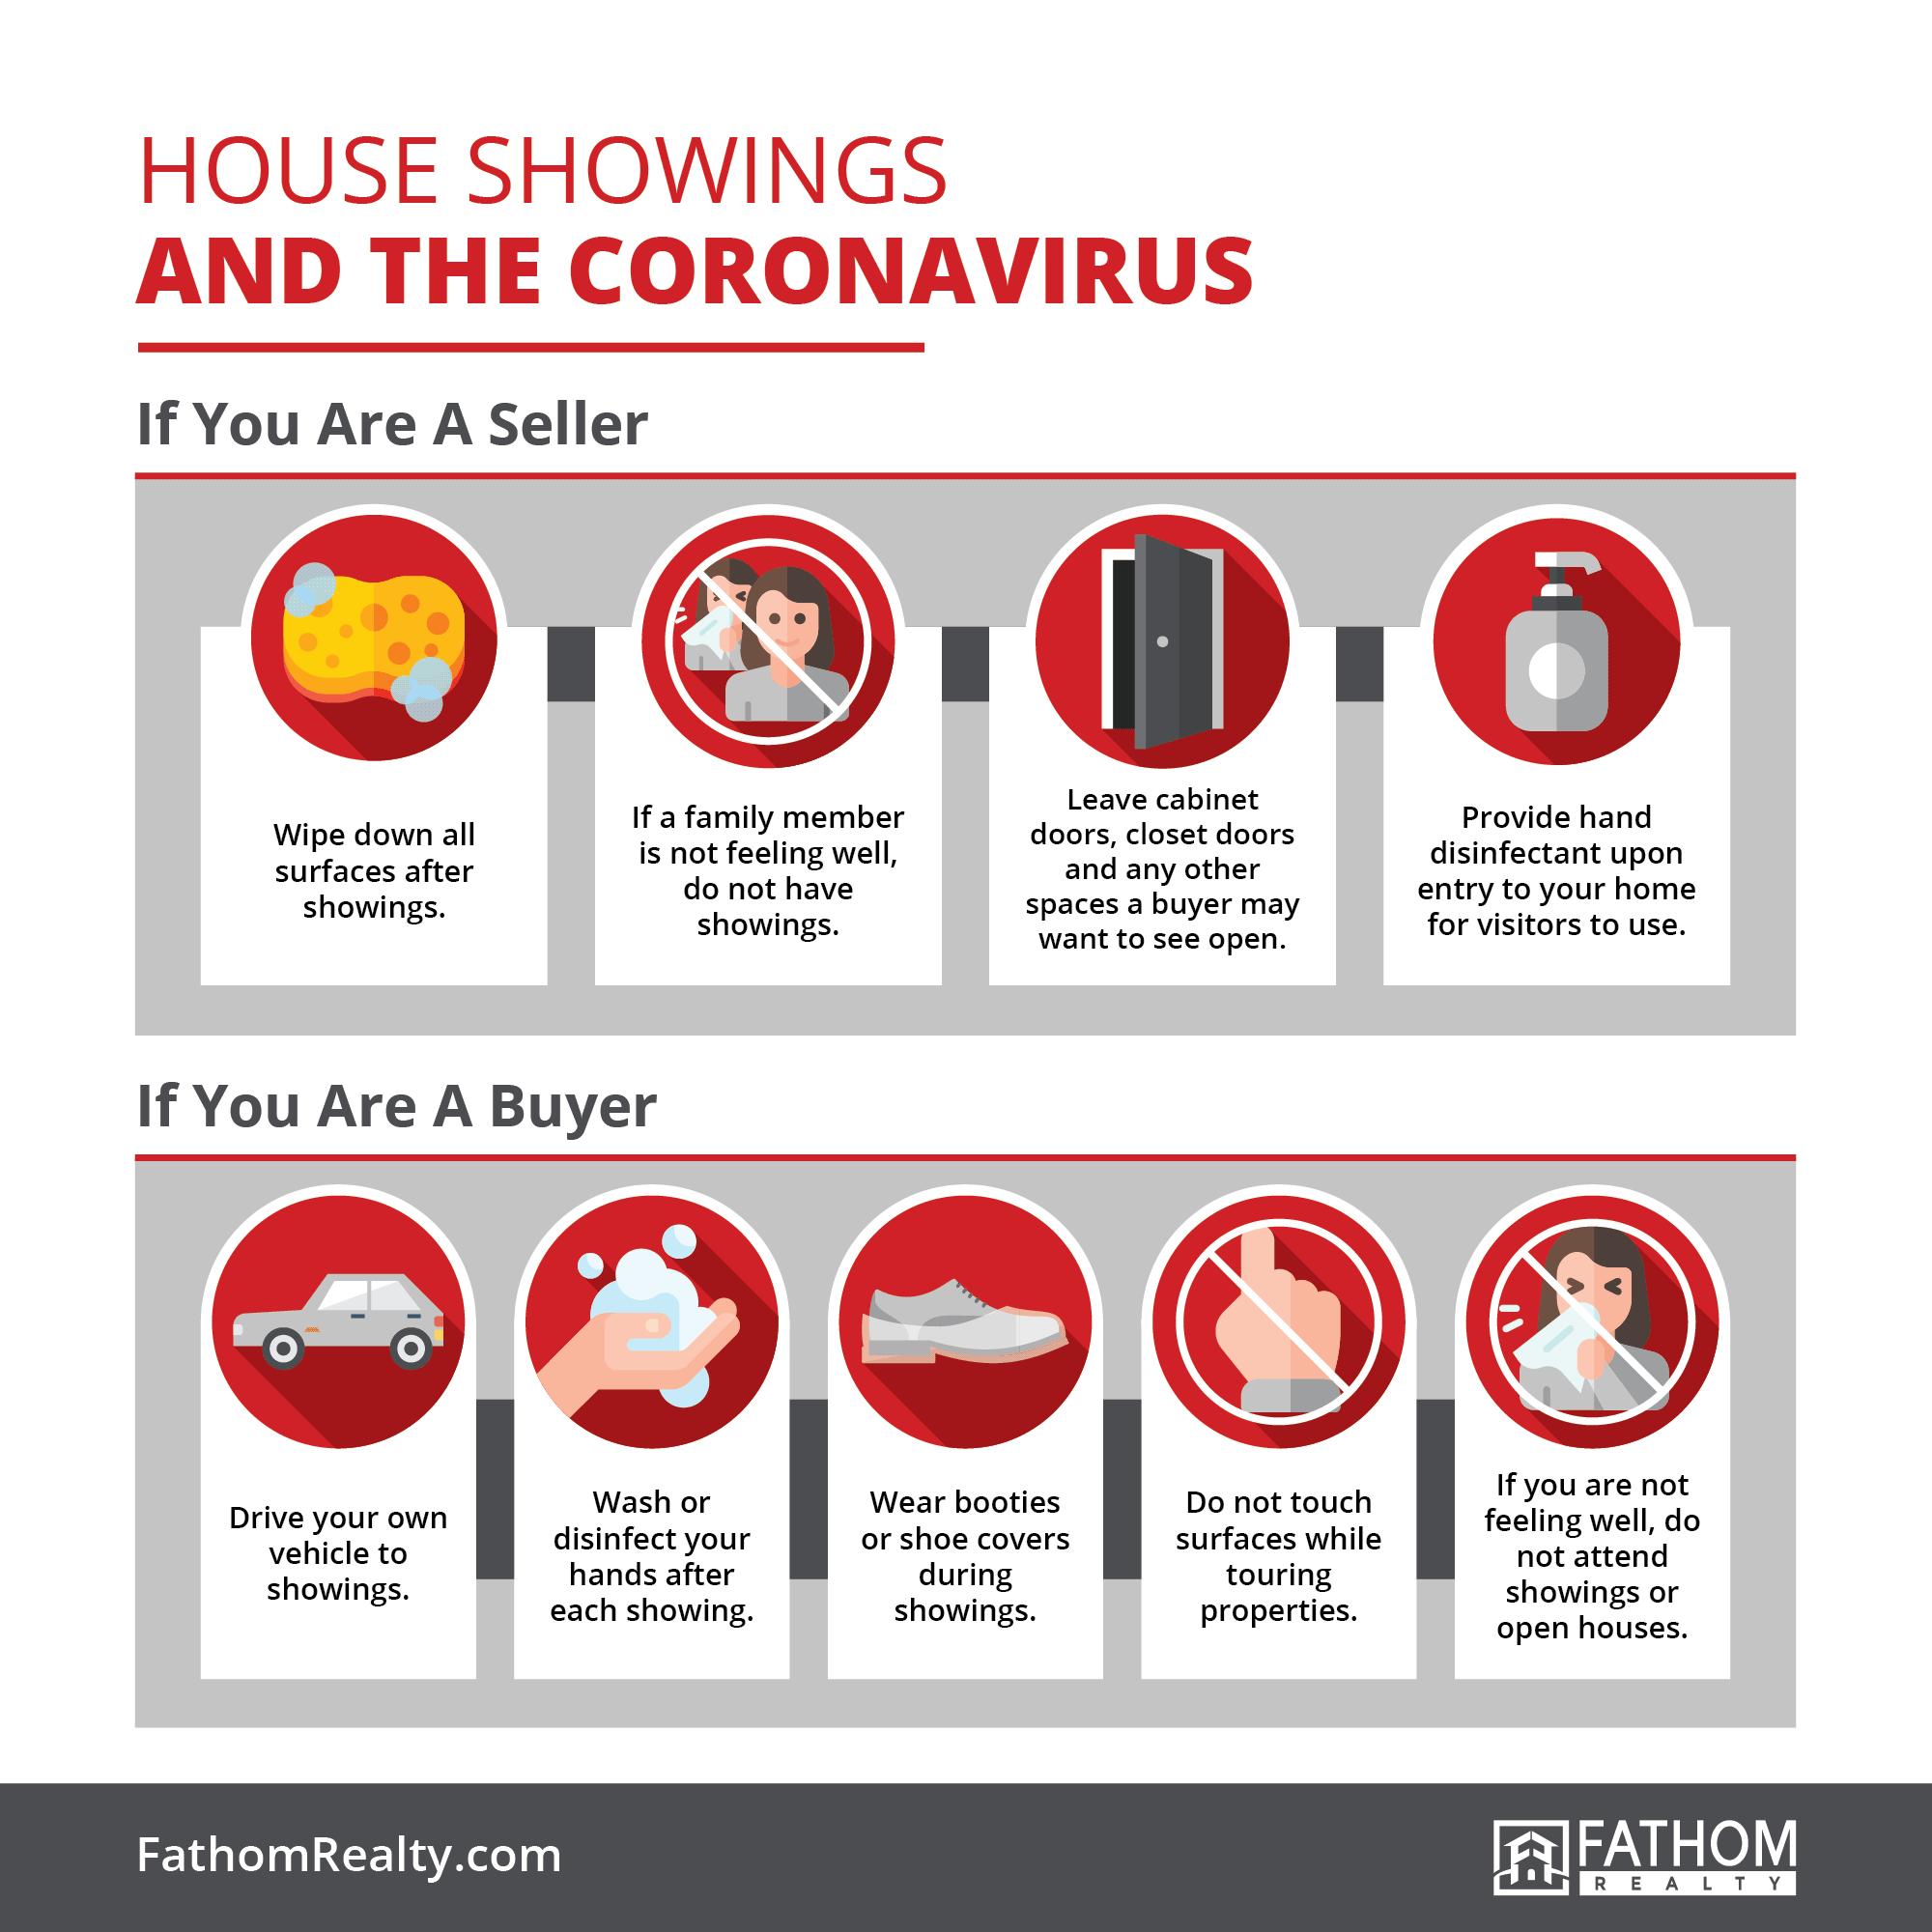 showing-instructions-for-corona-virus